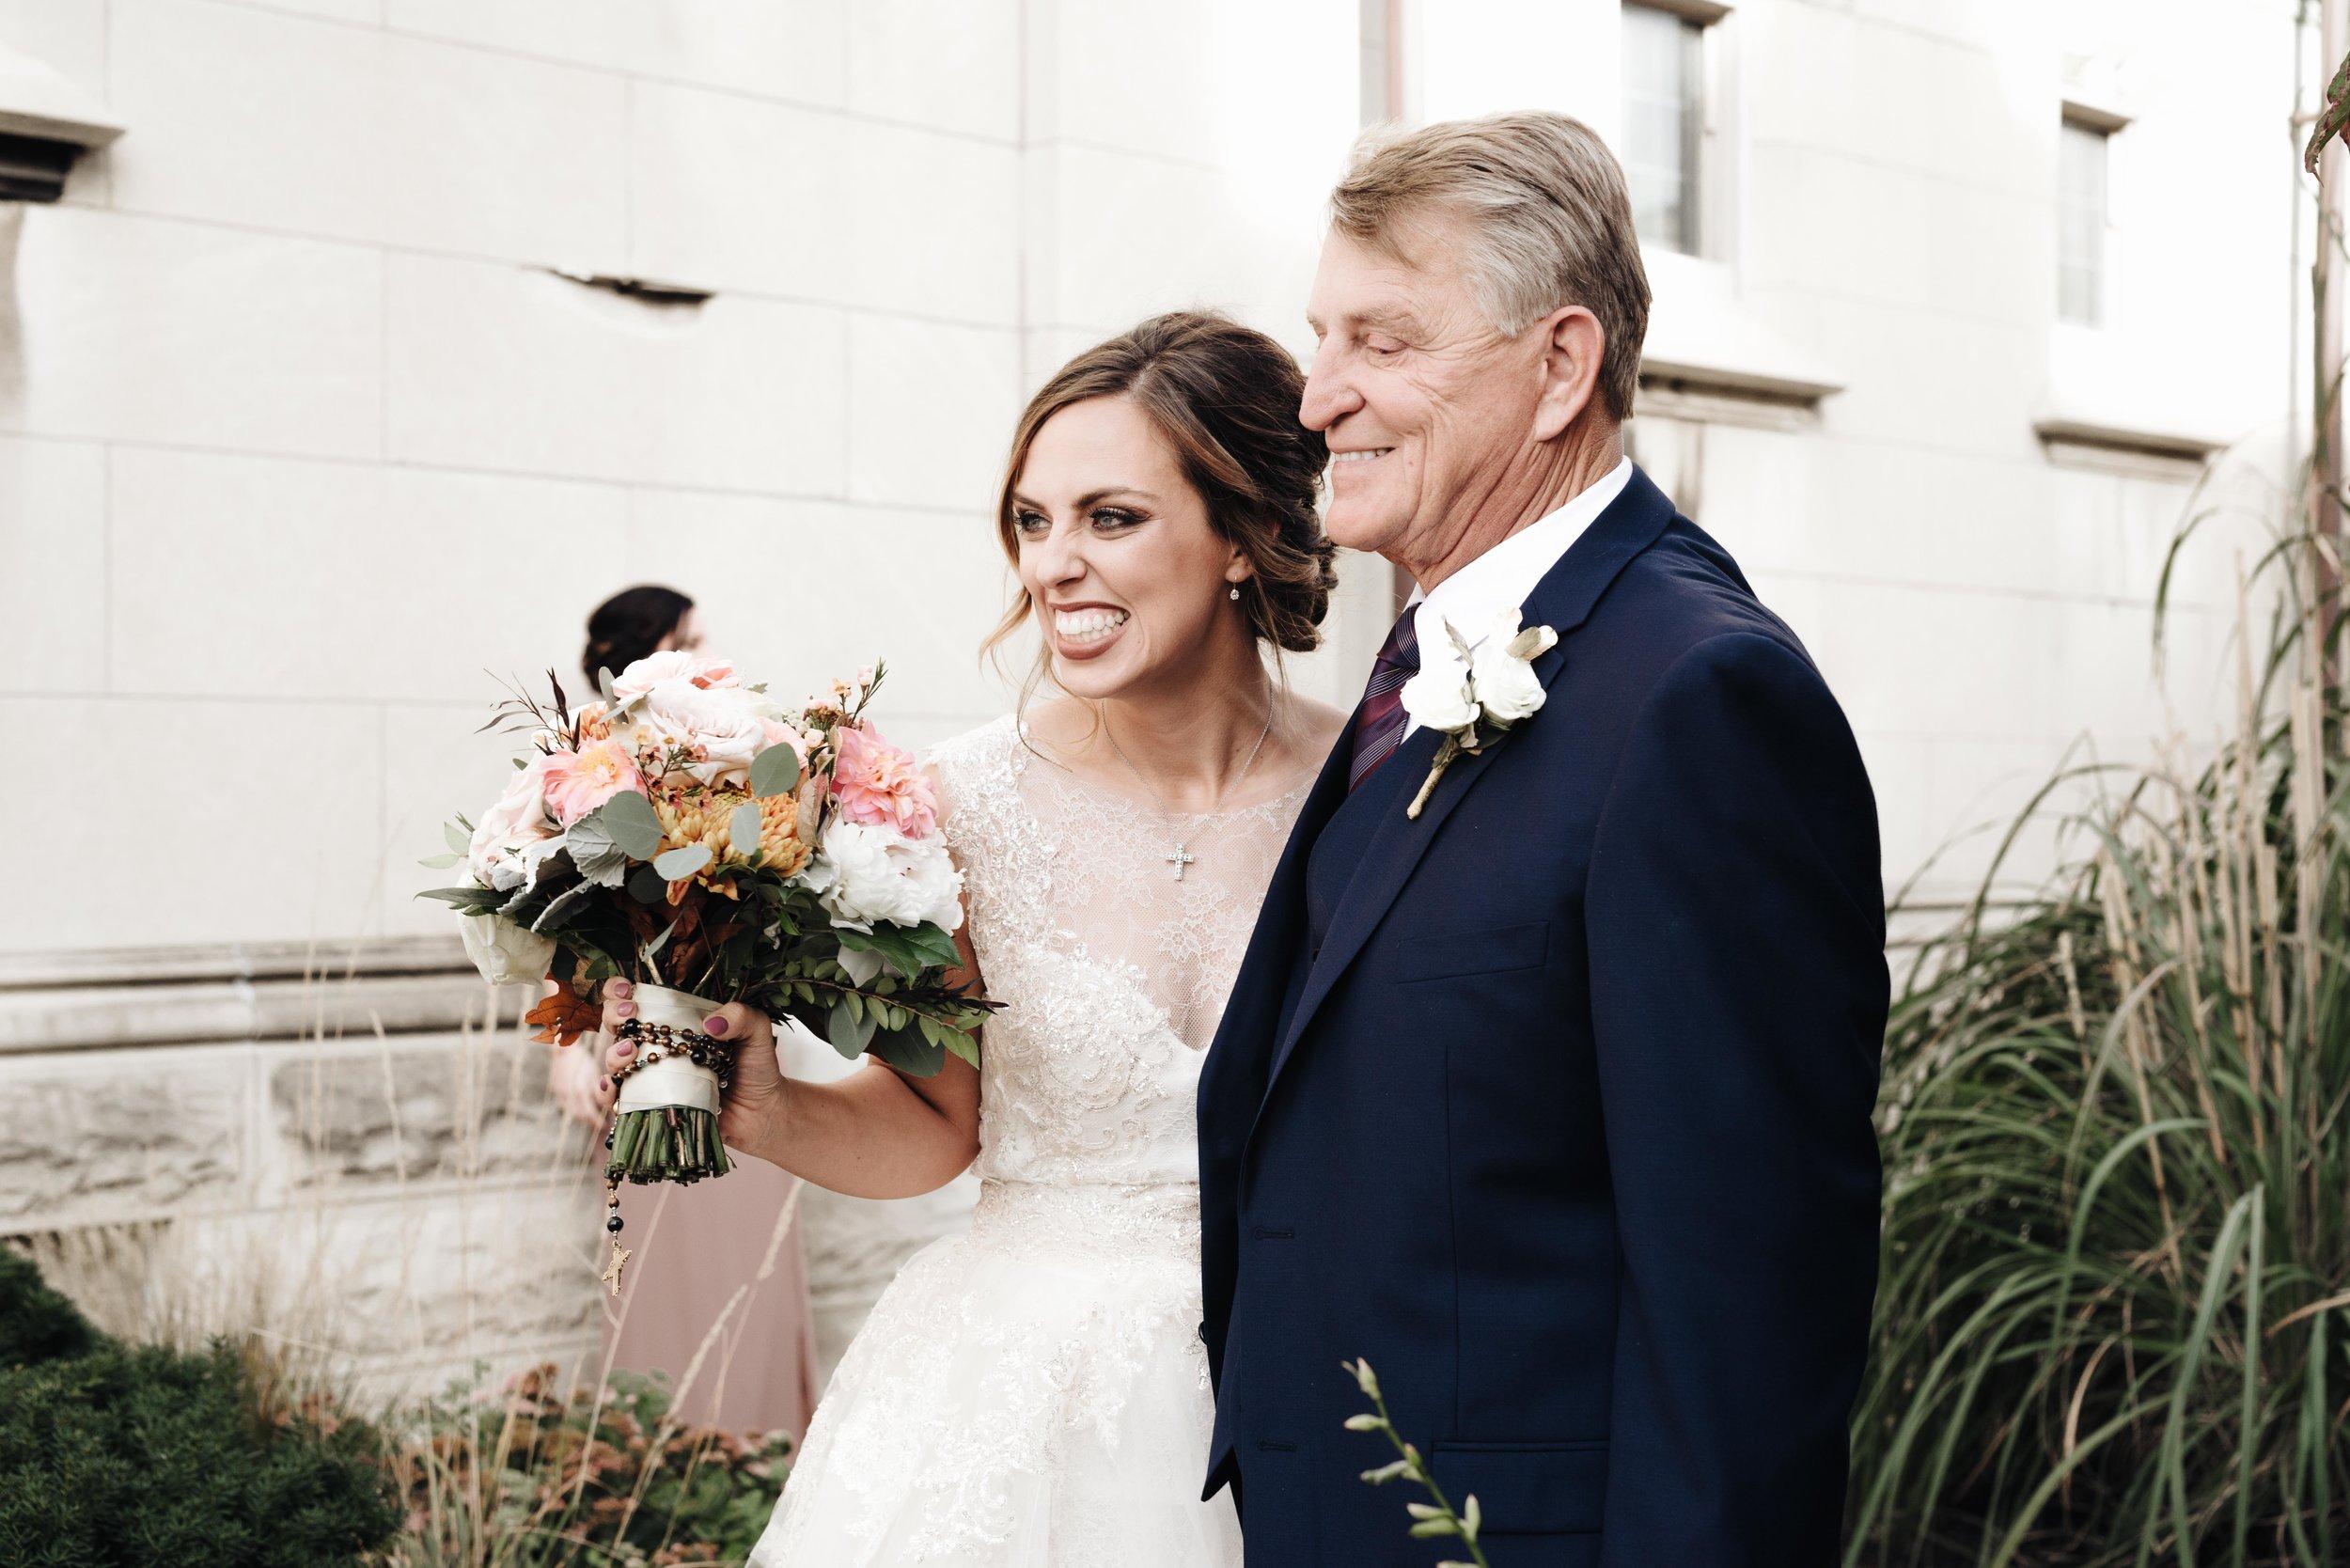 Carlee-Bob-Indianapolis-Wedding-Blog-43.jpg